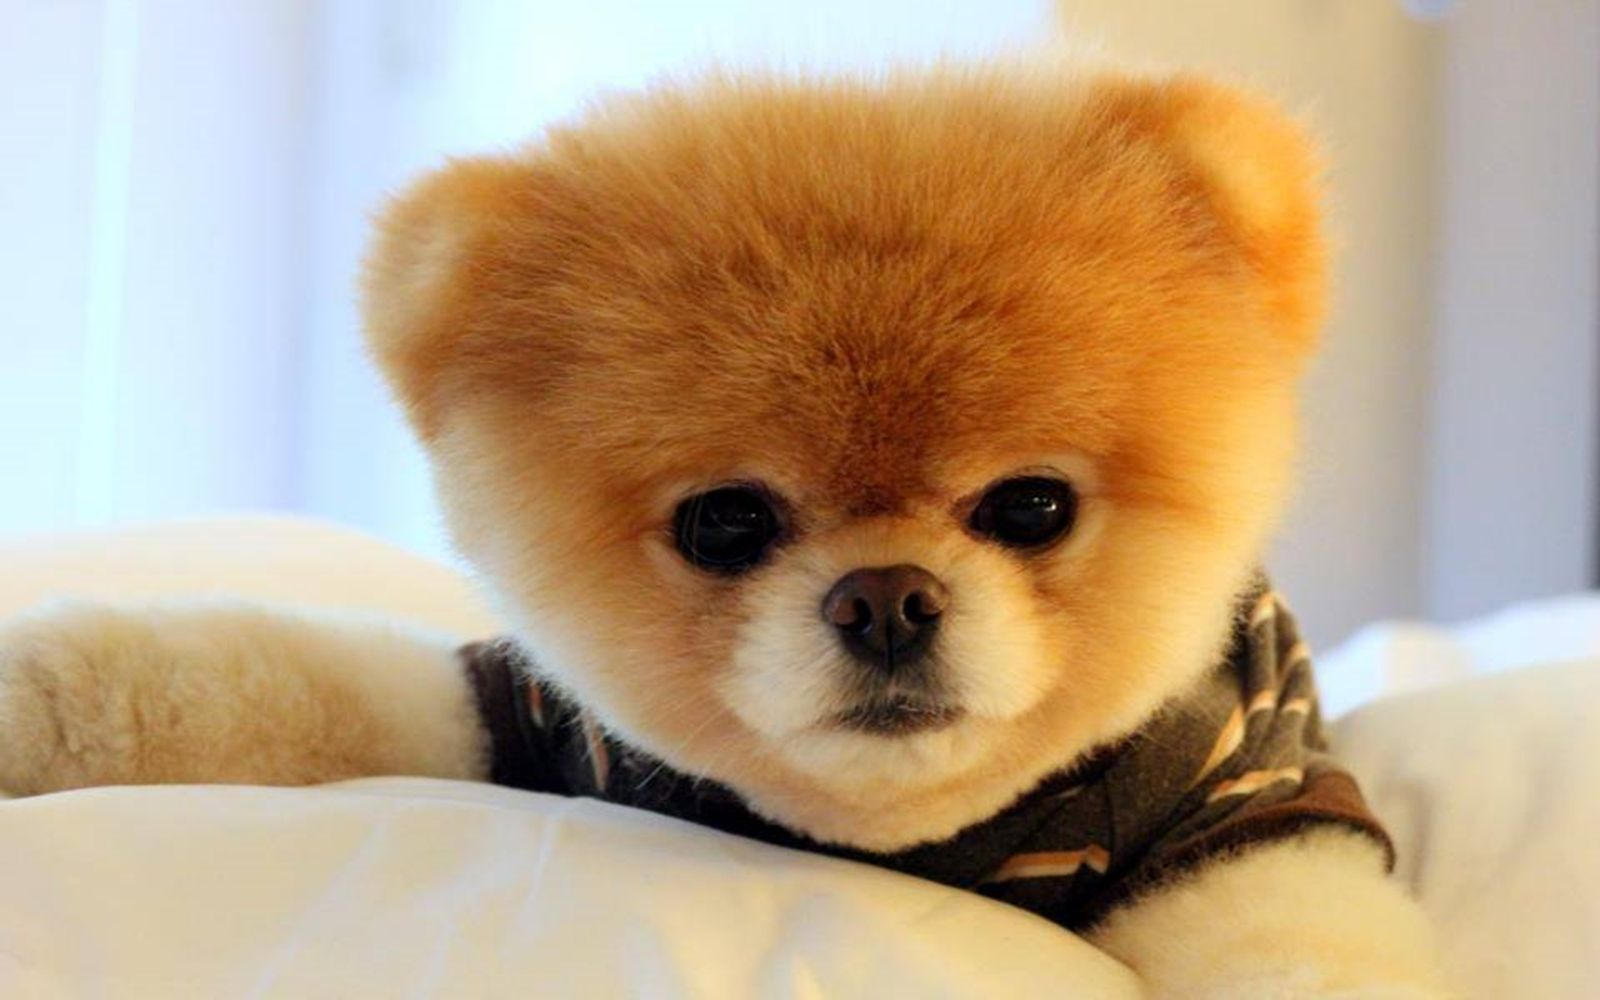 Good Boo Chubby Adorable Dog - 86f31aa26dcdc8cd474b1366f207fec1  Image_2811  .jpg